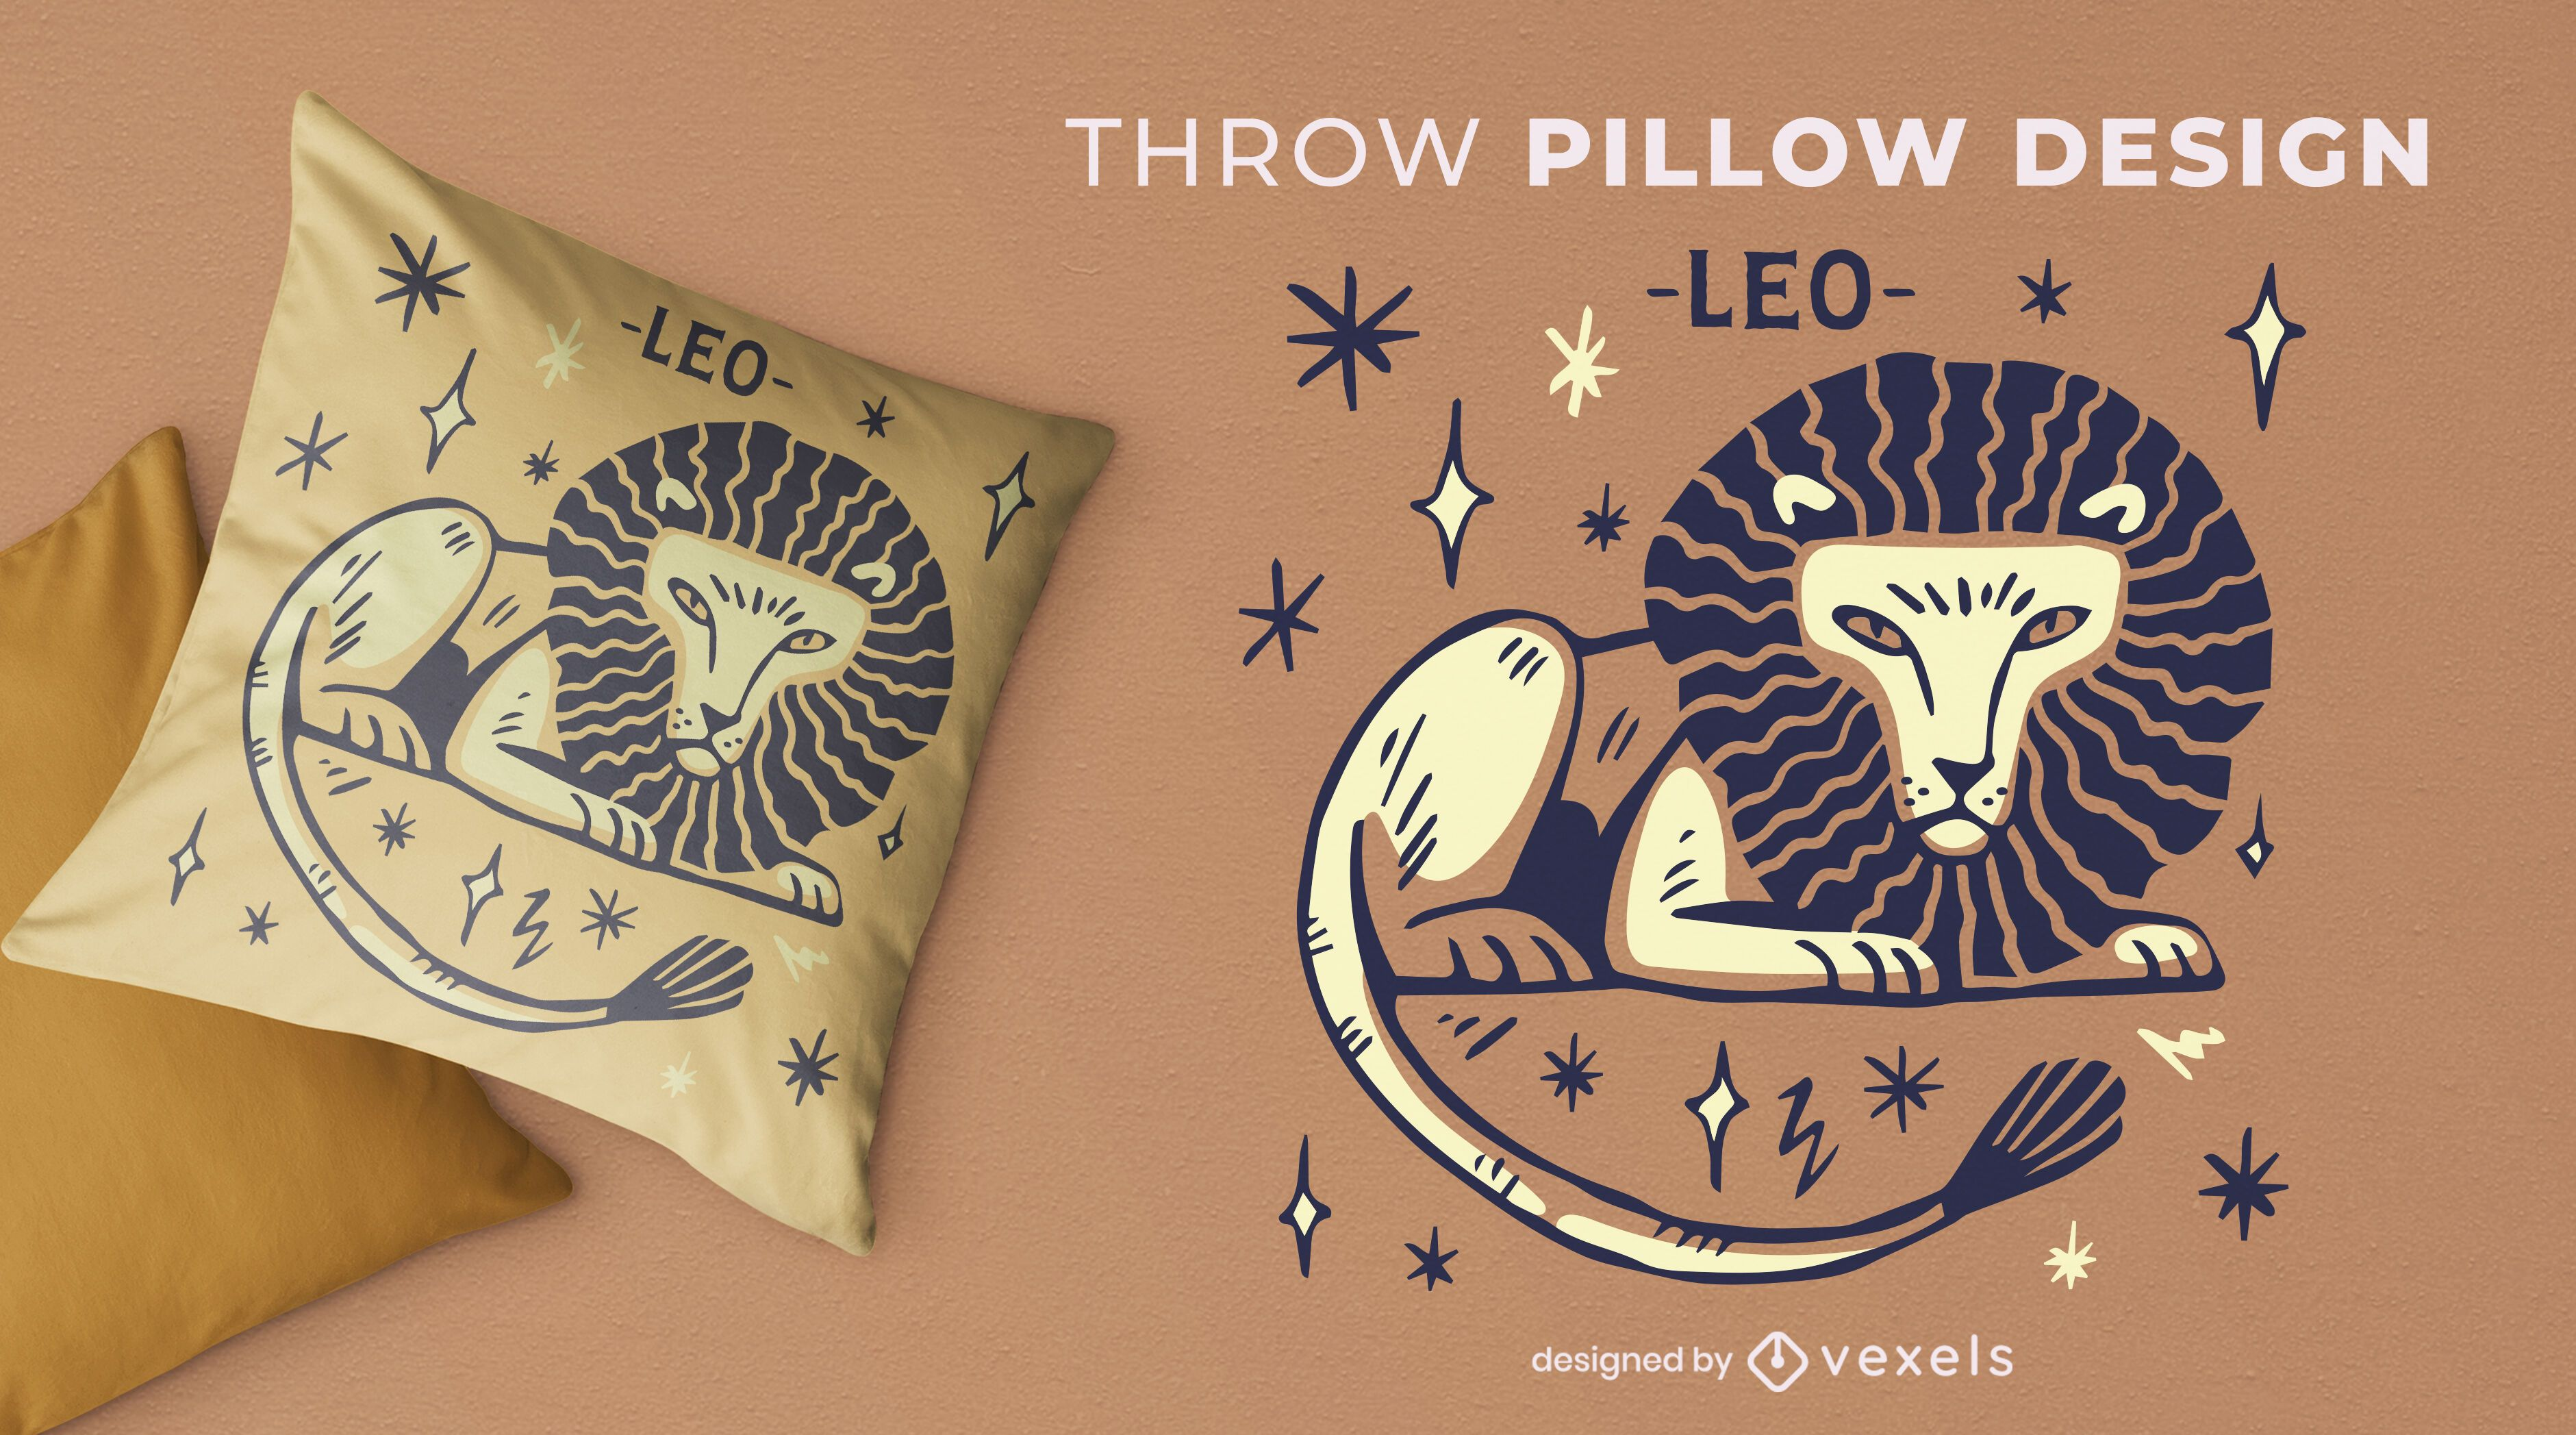 Leo zodiac sign hand drawn throw pillow